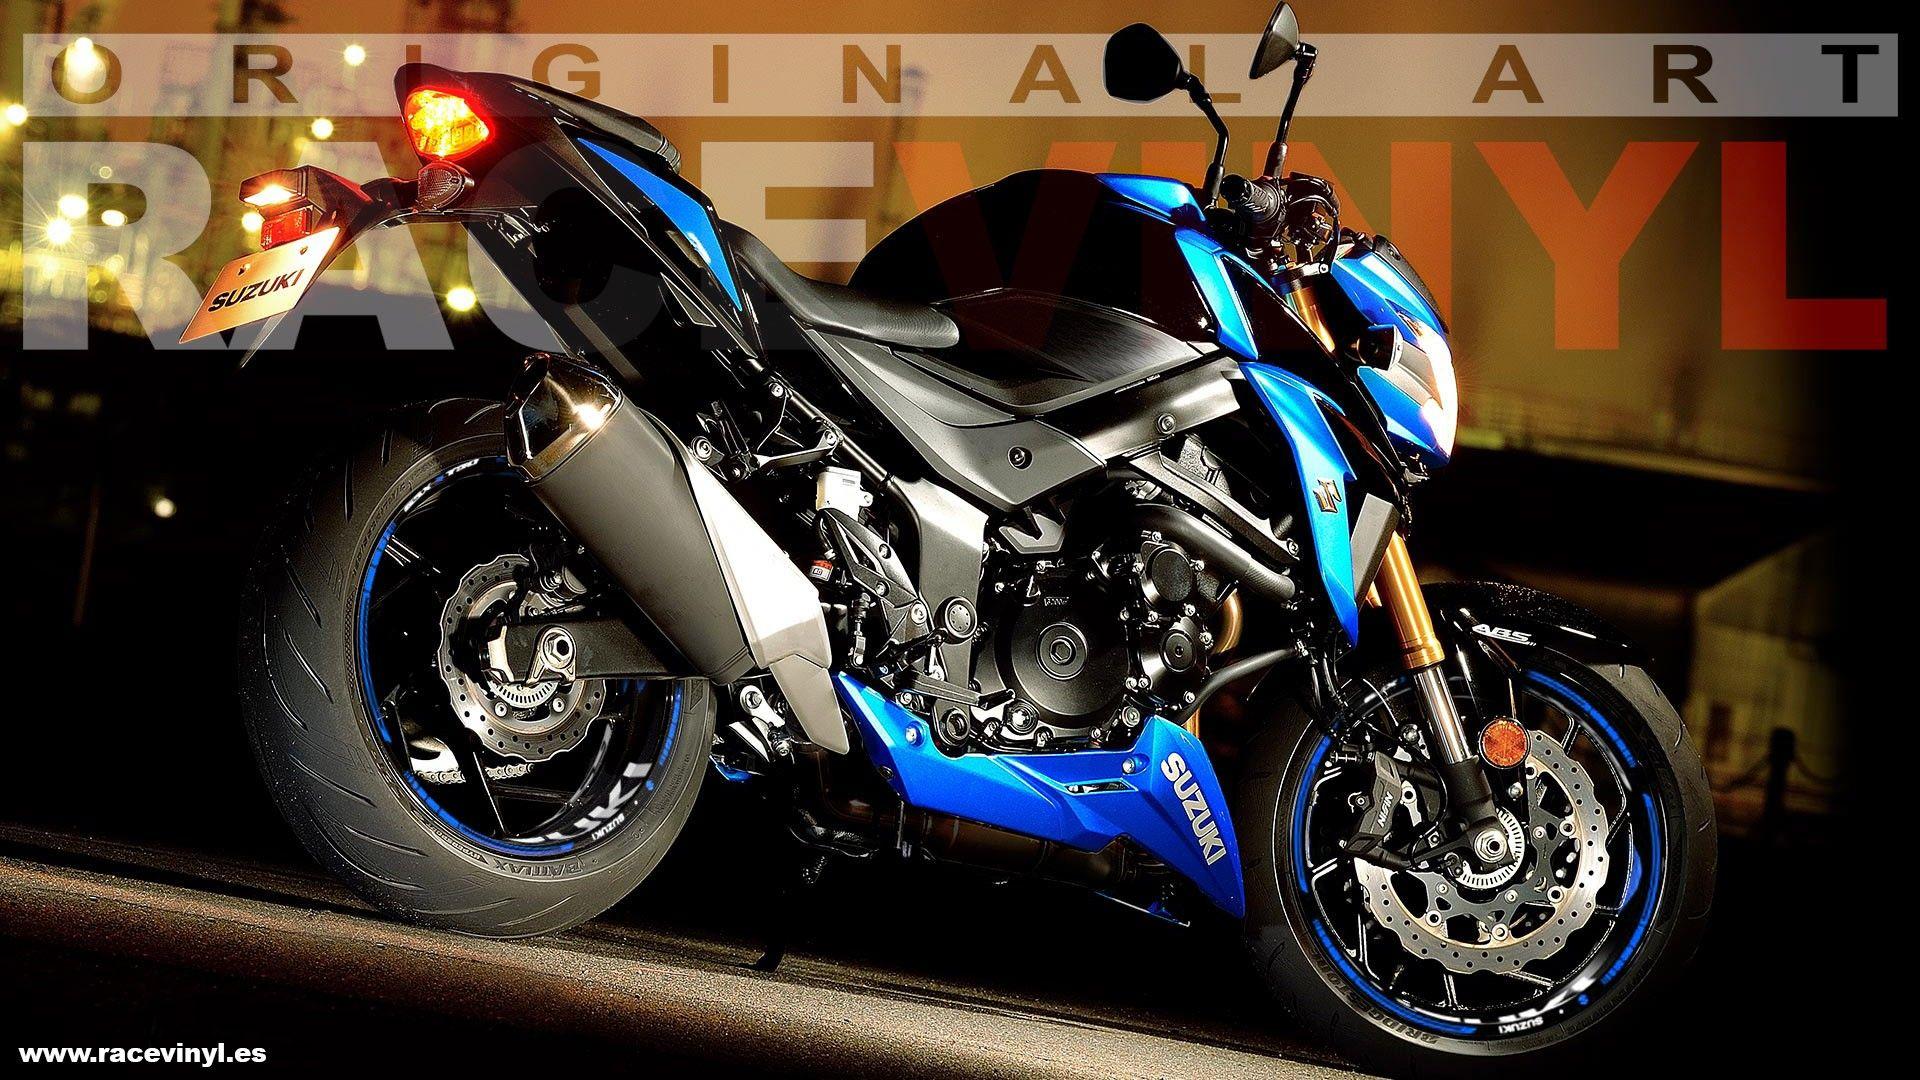 Kit-PRO-Suzuki-GSX-S-750-GSXS-GSXS750-Pegatinas-para-llantas-vinilo-motos-adhesivos-moto